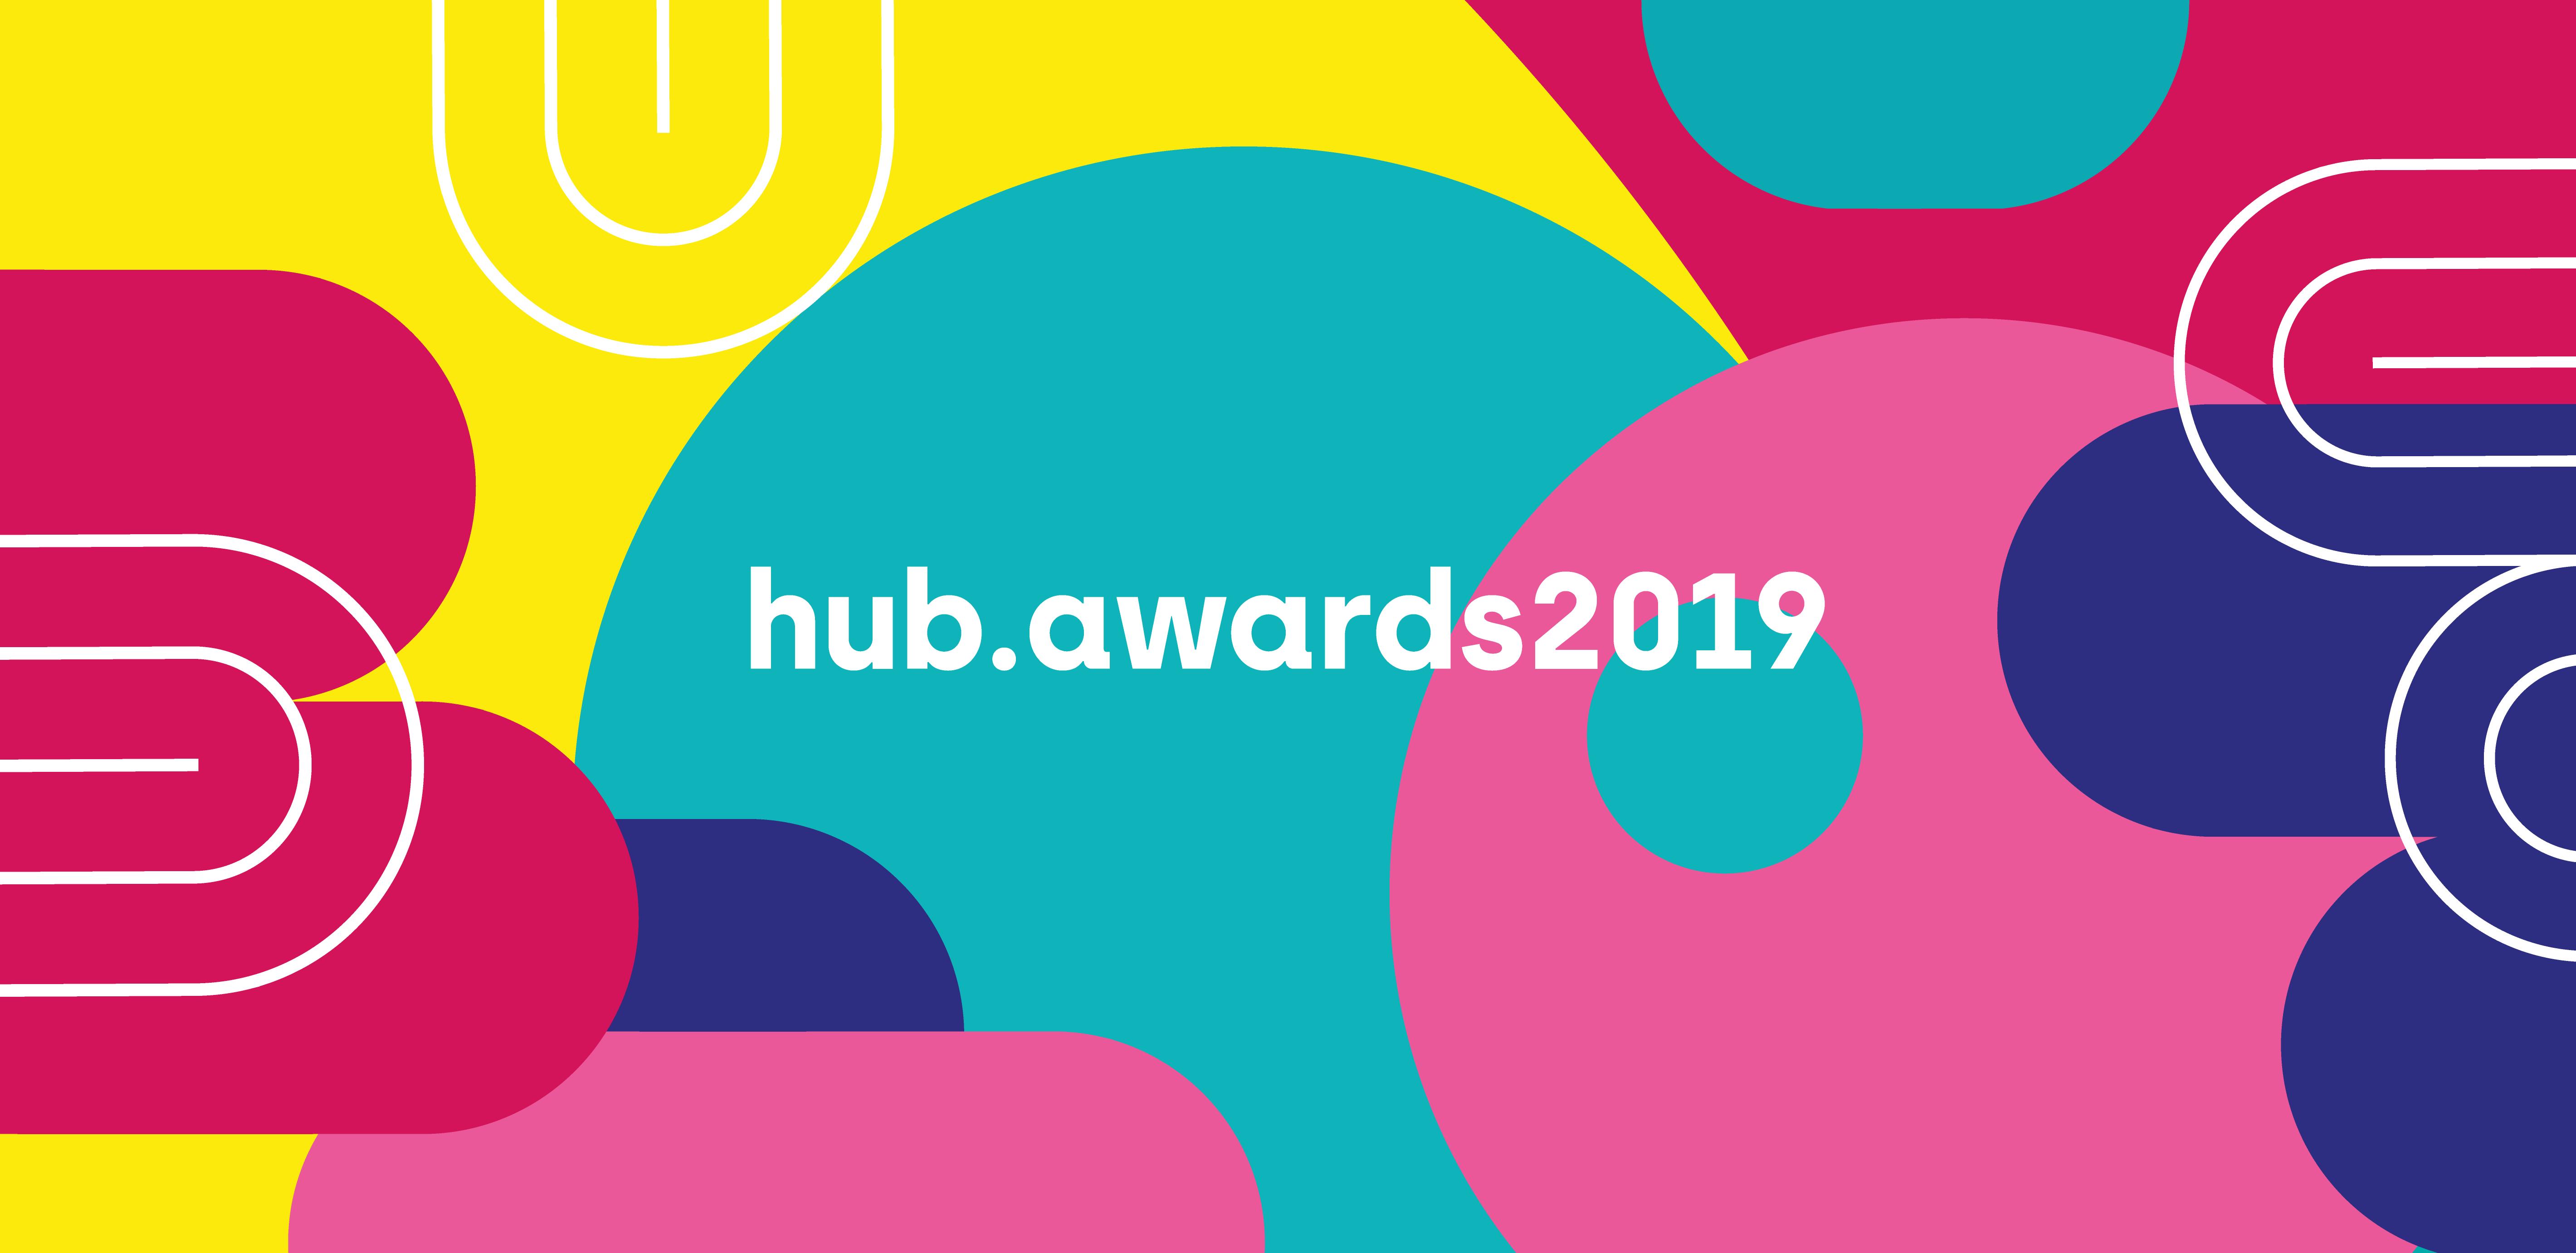 hub.awards2019: carton plein!